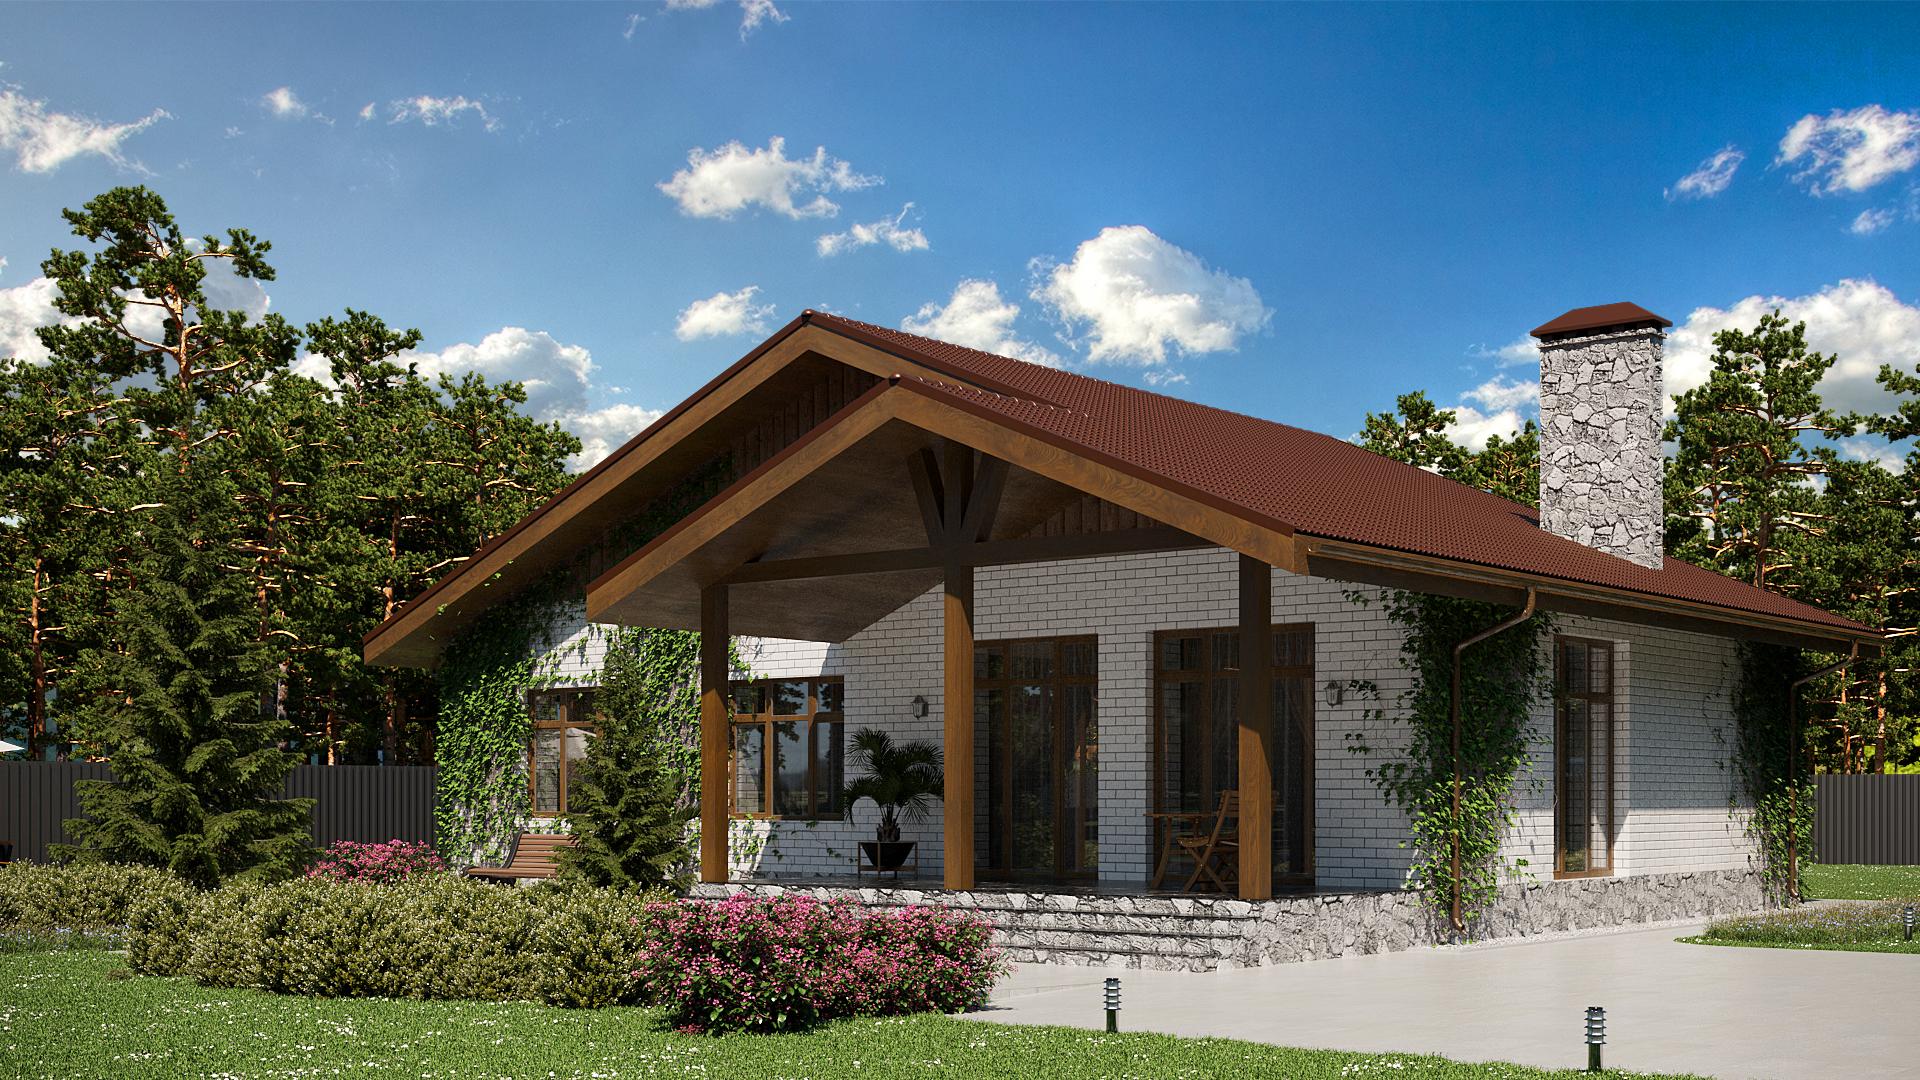 Готовый проект дома 115 кв.м // Артикул СТ-141 фасад